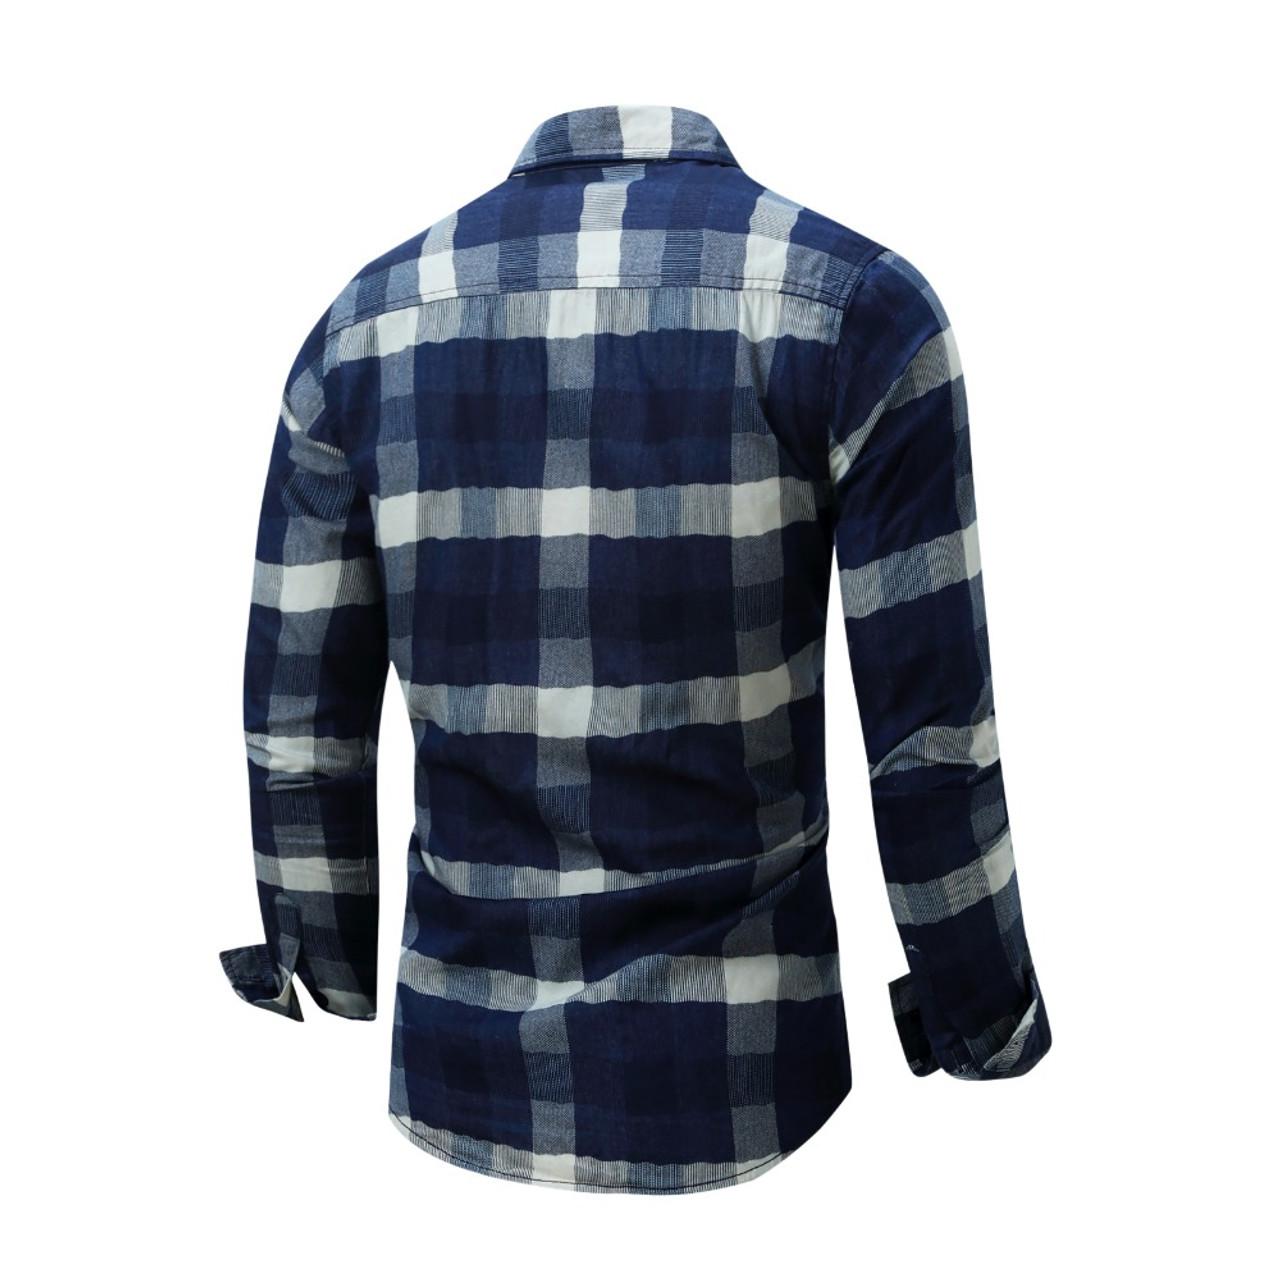 4732cf068b41 ... NORMEN Brand Clothing Men's Plaid Shirts Top Grade Denim Shirt Full  Sleeve Easy Care Shirt For ...